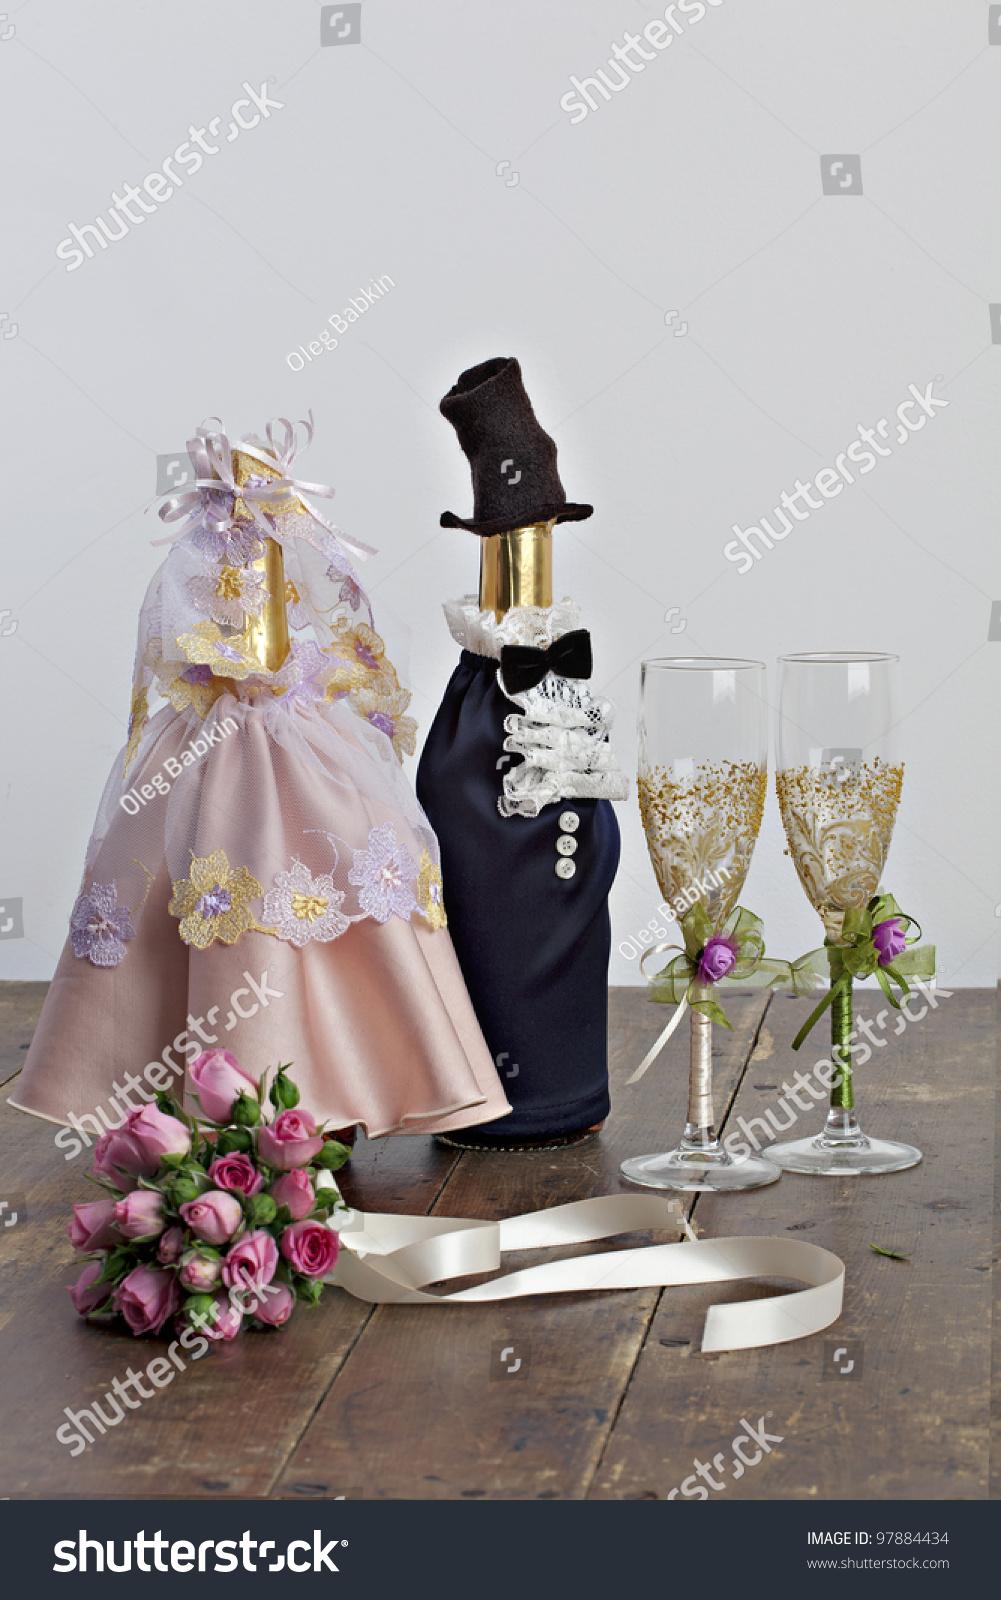 Champagne Bottle Decoration Wedding Decoration Bottle Champagne Glasses Bridal Stock Photo